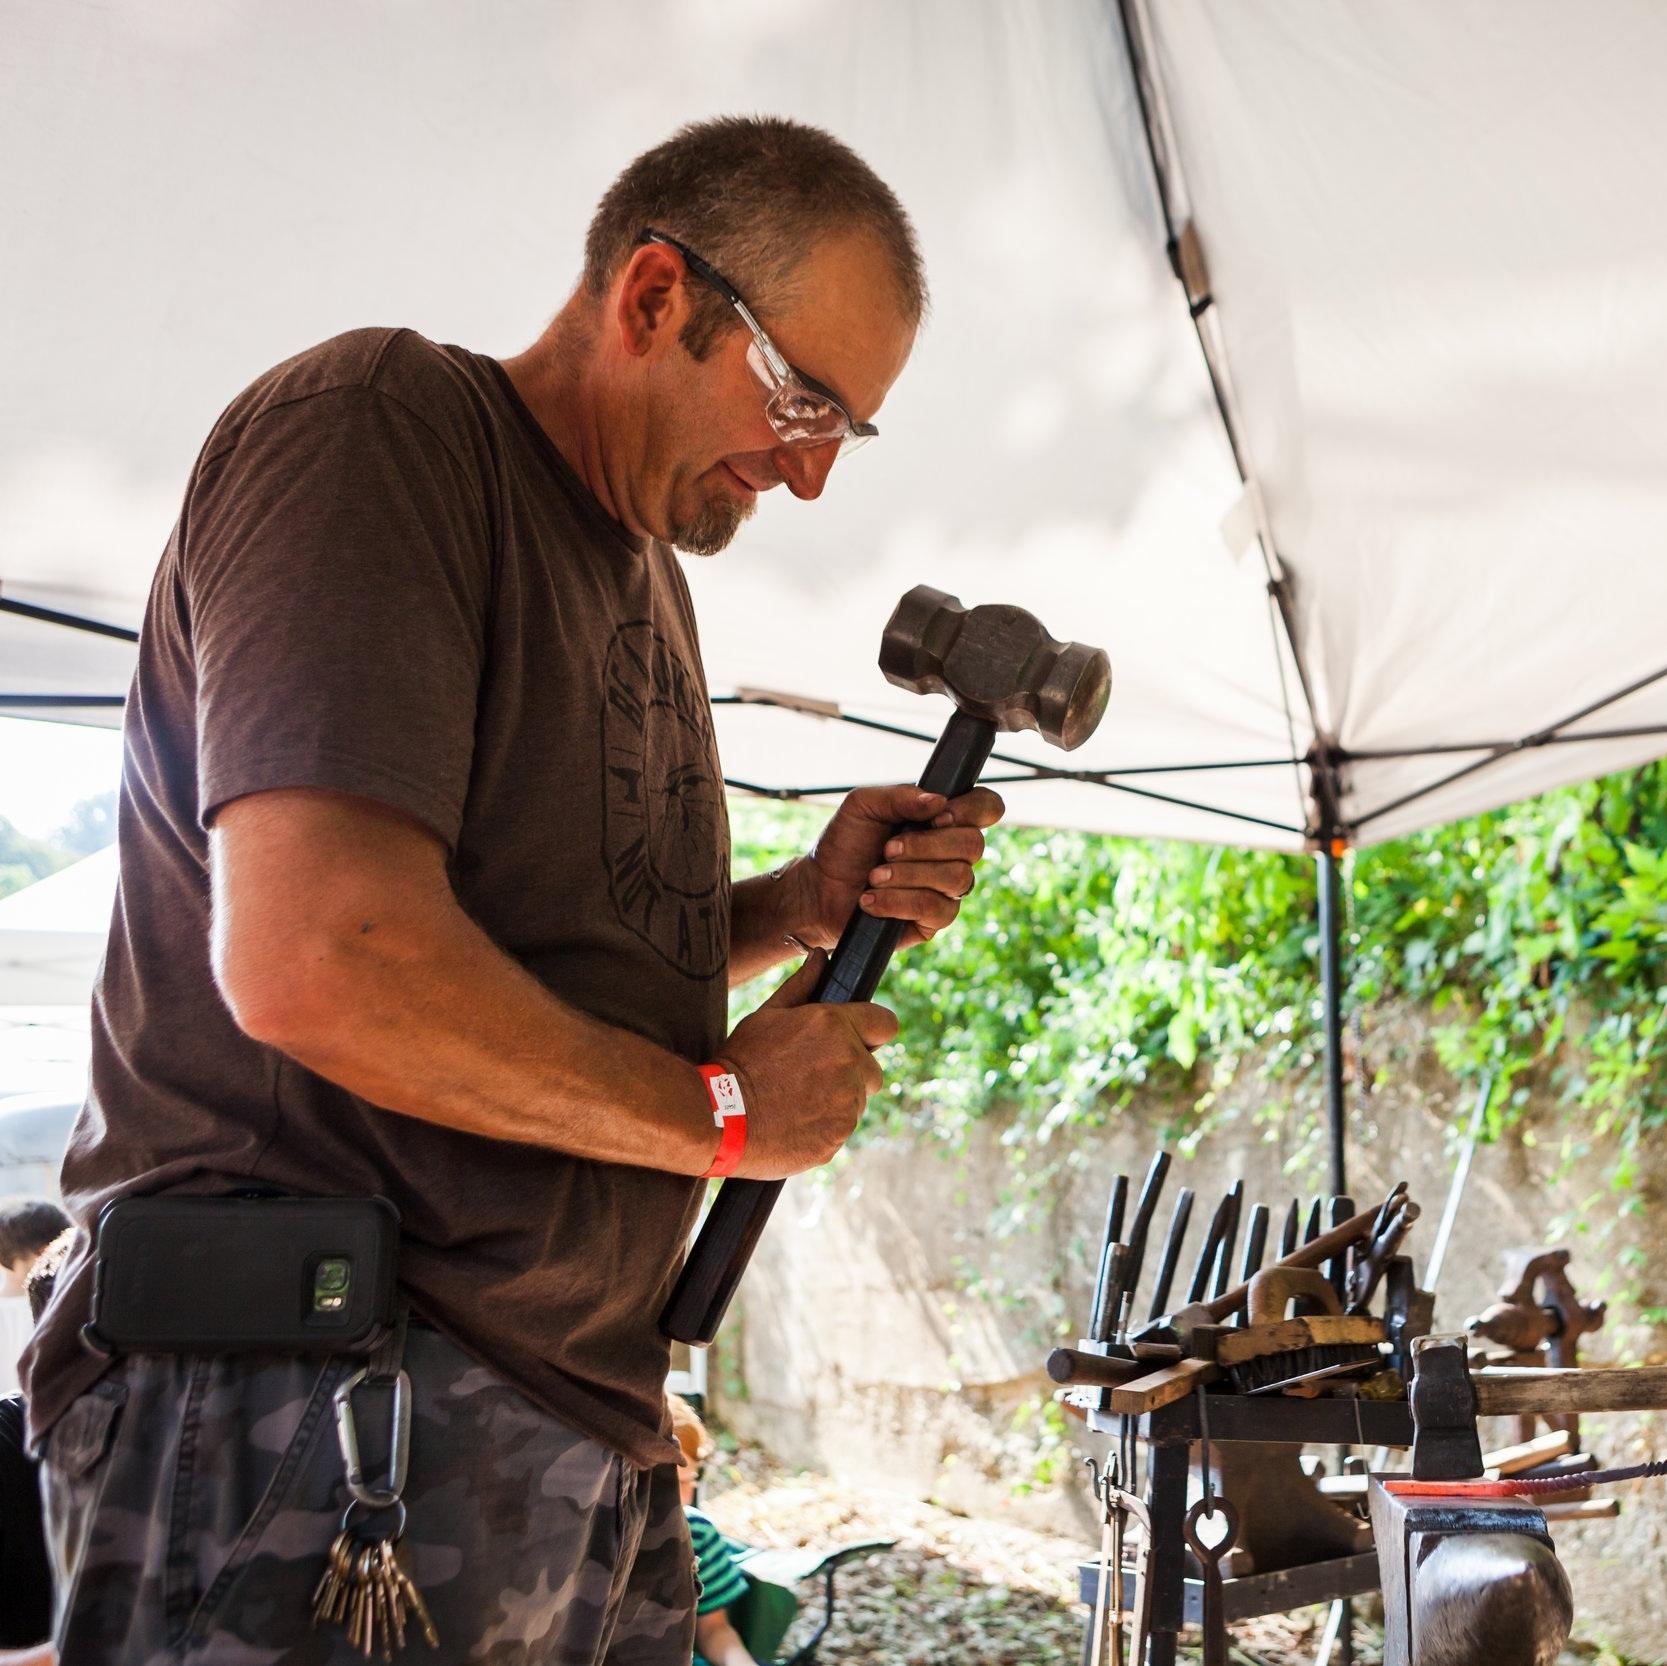 King Forge - Steve King, Blacksmithing since 2003